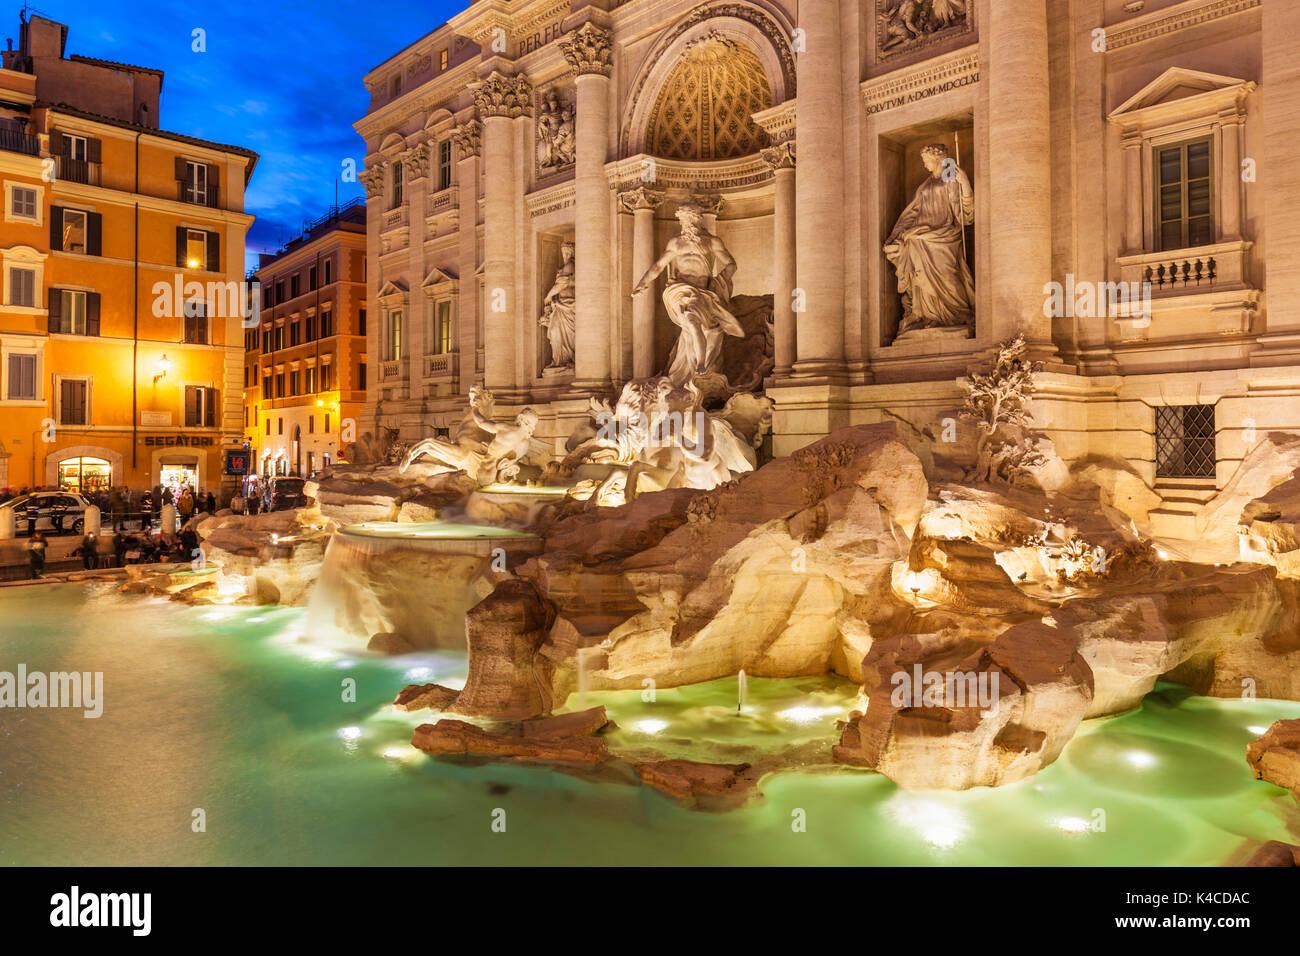 Rom Italien Der Trevi-brunnen unterstützt durch den Palazzo Poli bei Nacht beleuchtet, Rom, Italien Latium EU Europa Stockbild